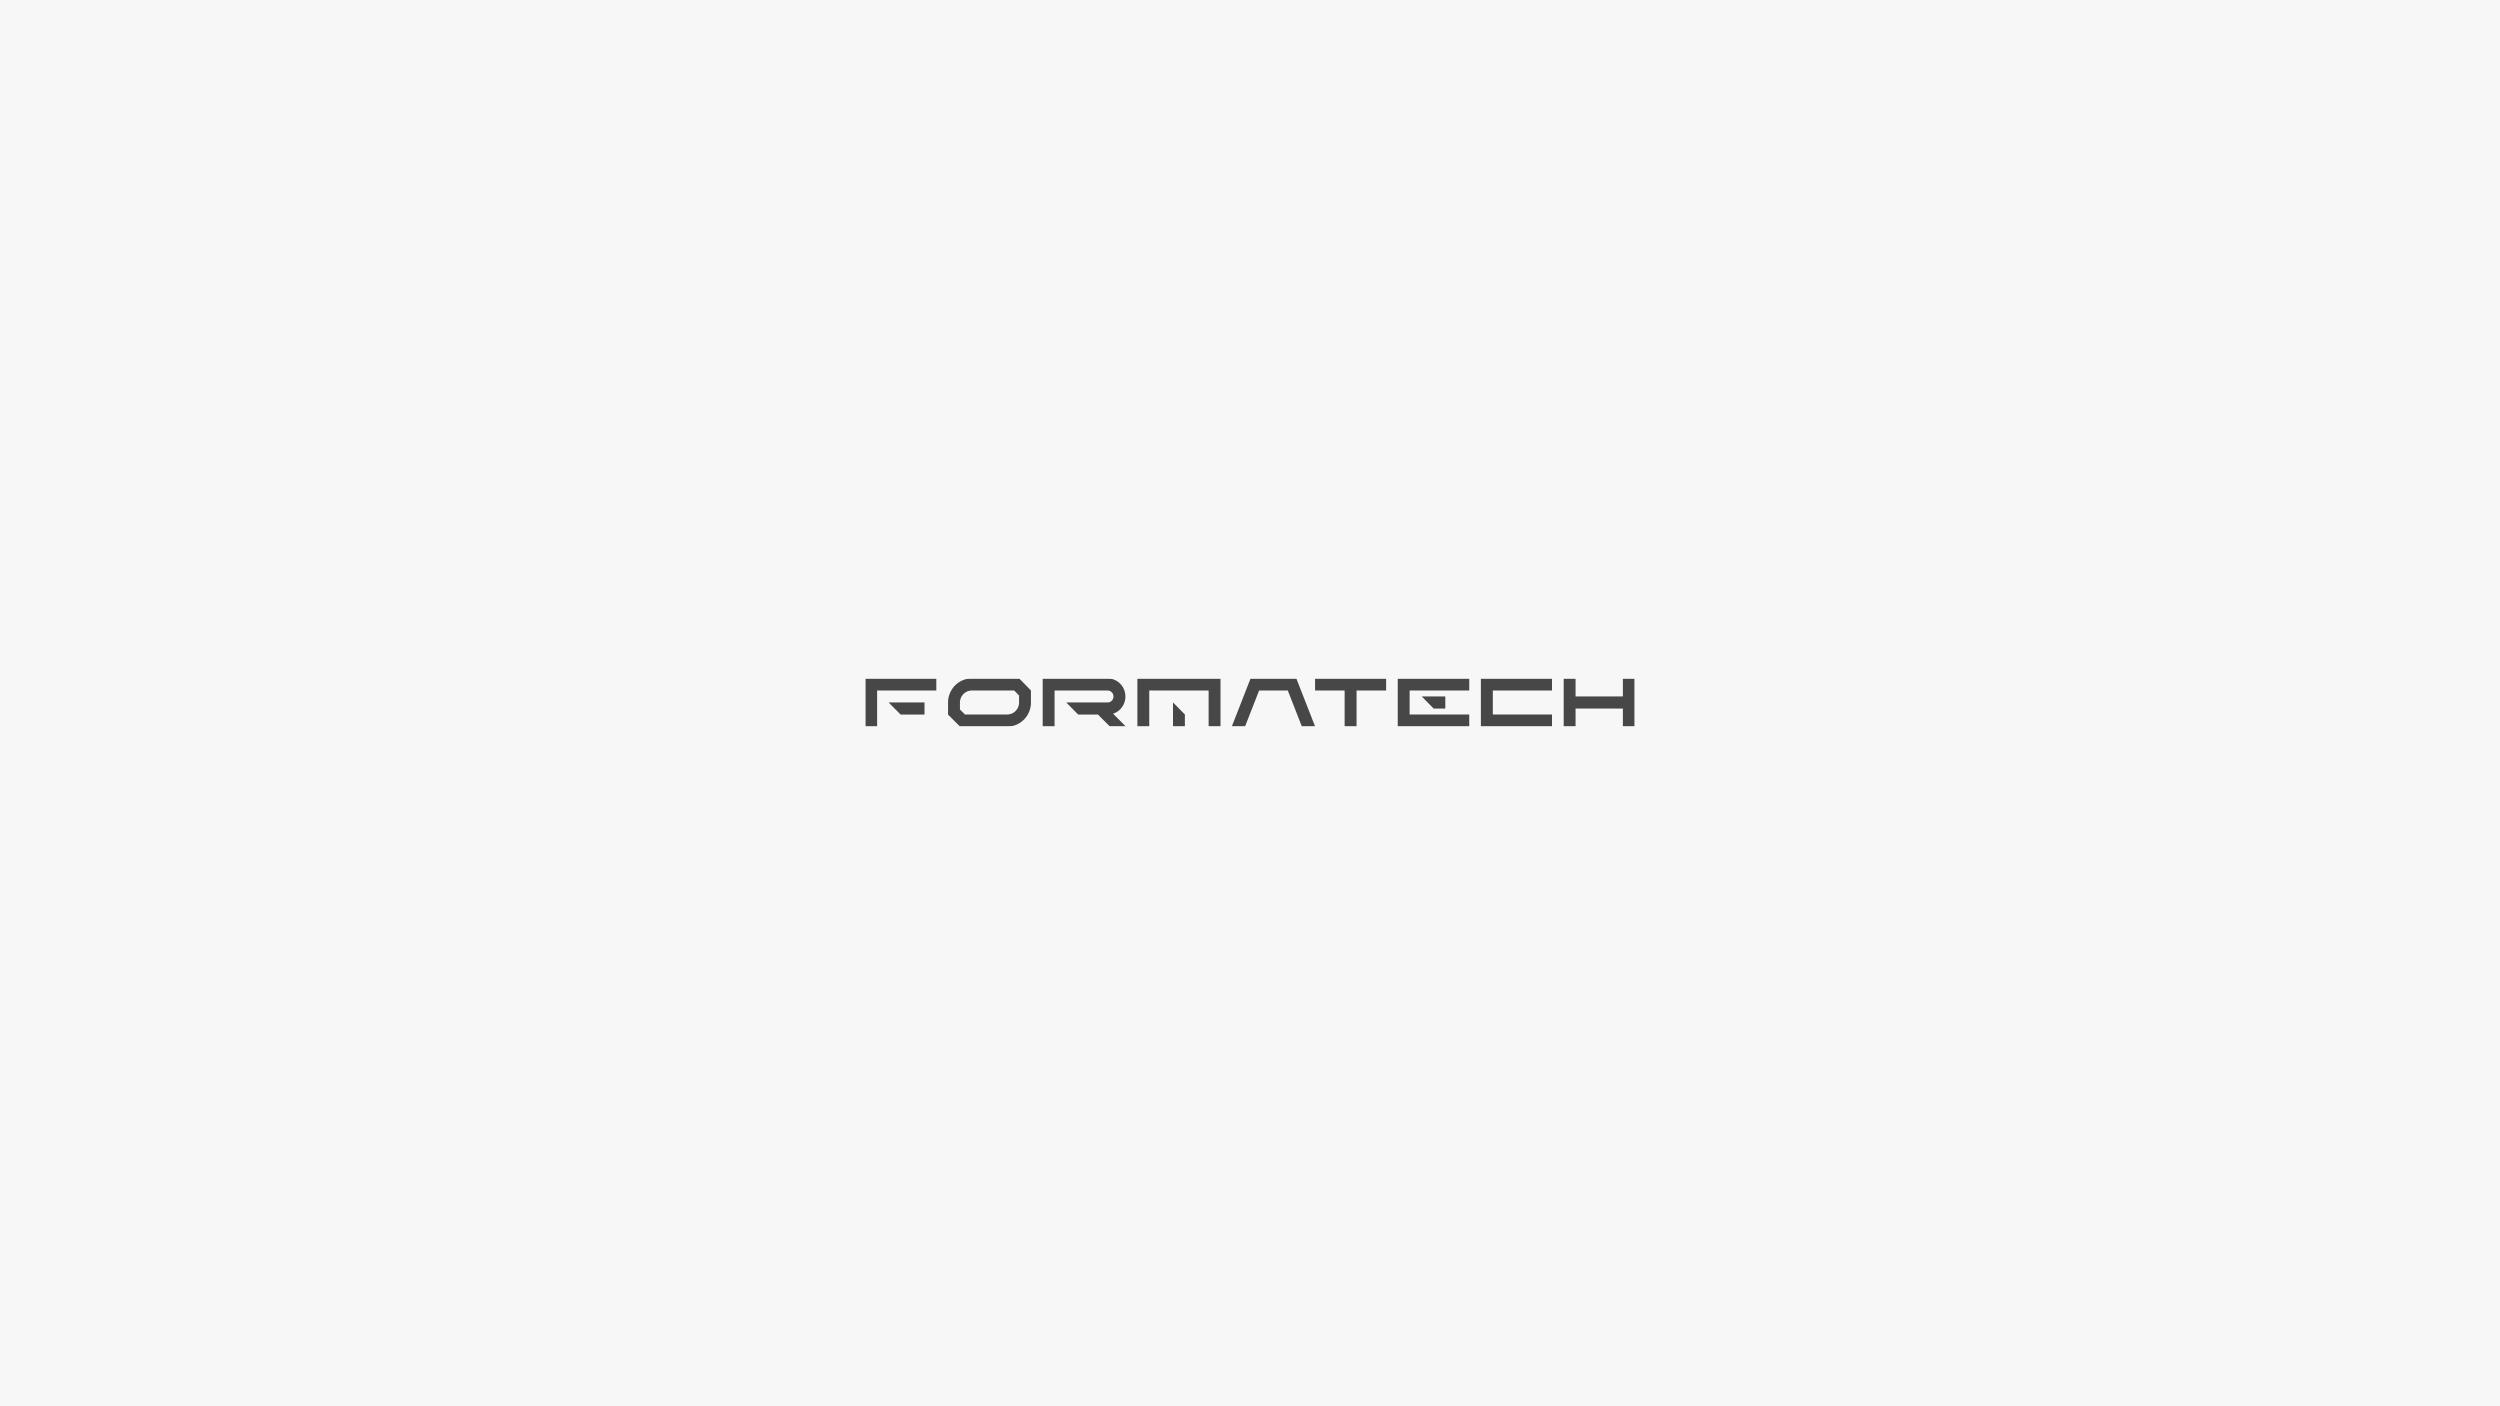 formatech_v_2